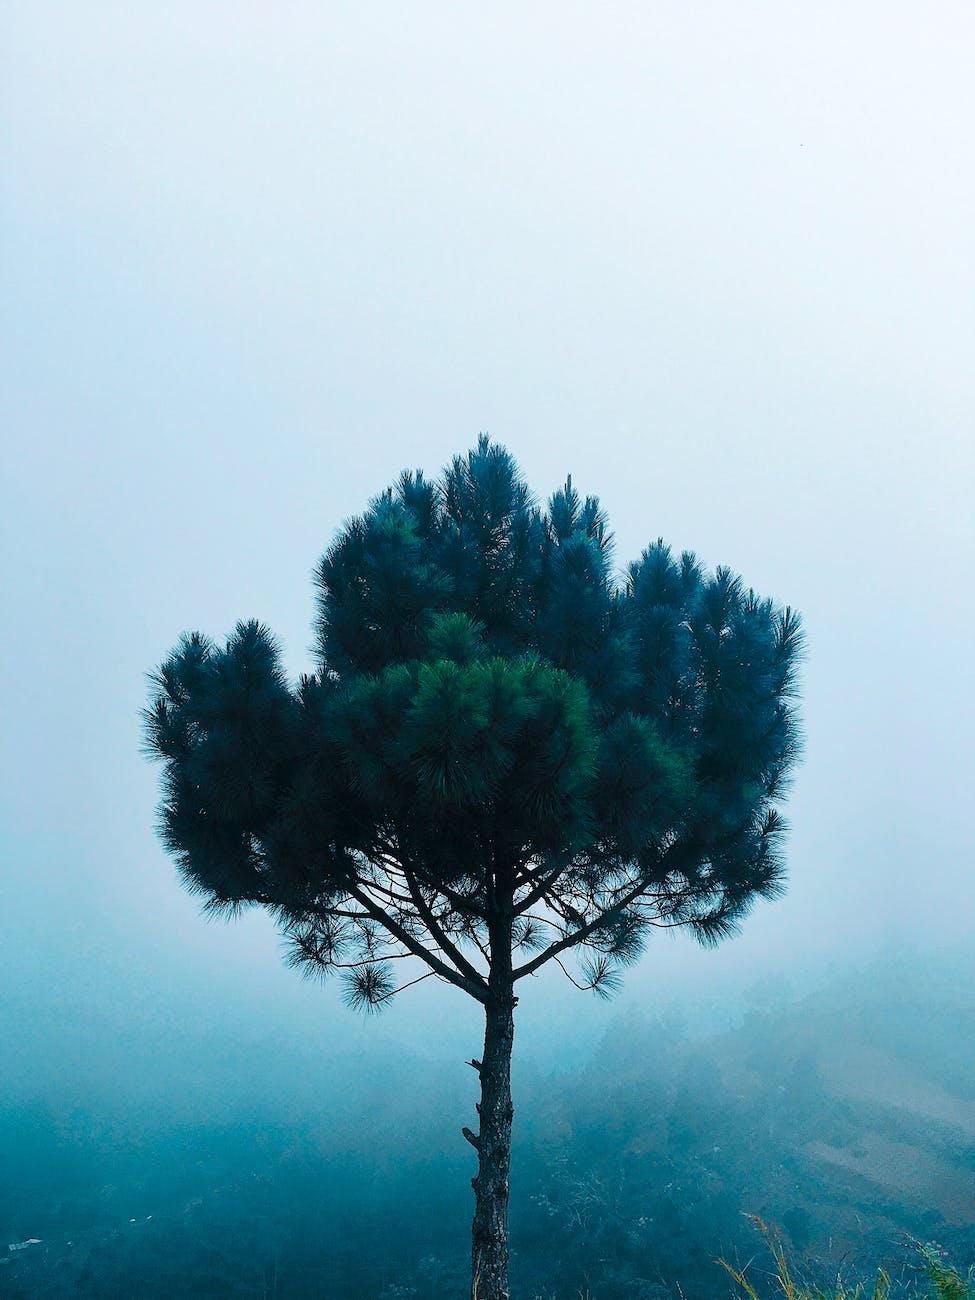 dream of a tree